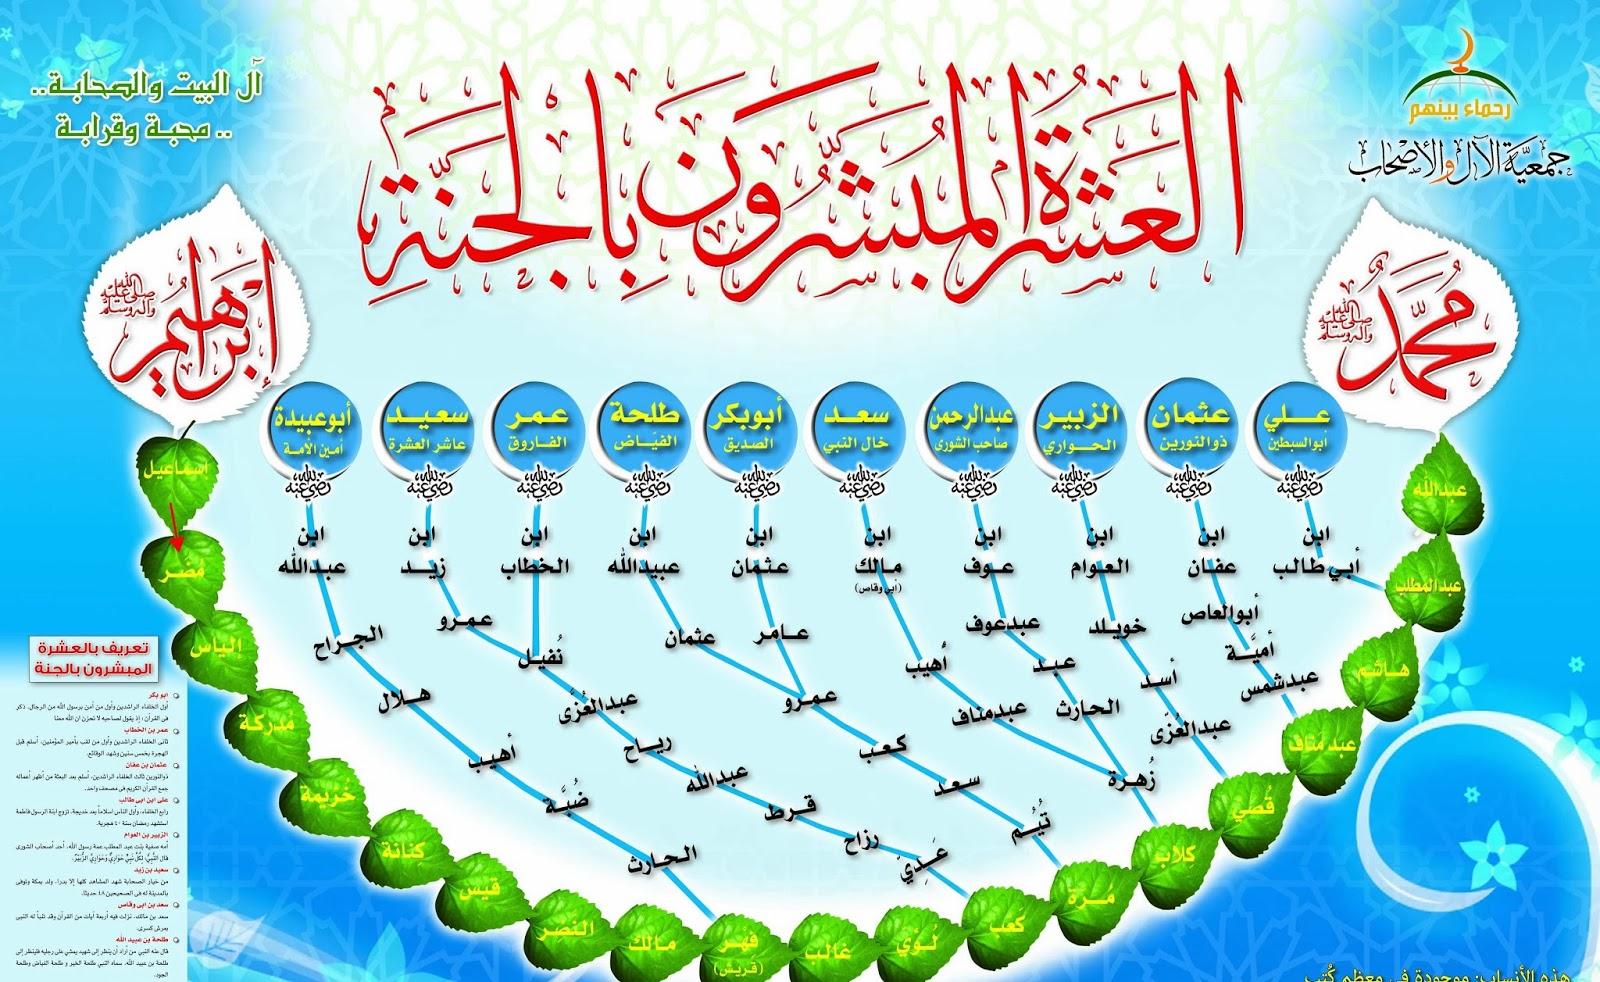 b00127677 إبراهيم عليه السلام   رضاك ربي رضاك أمي